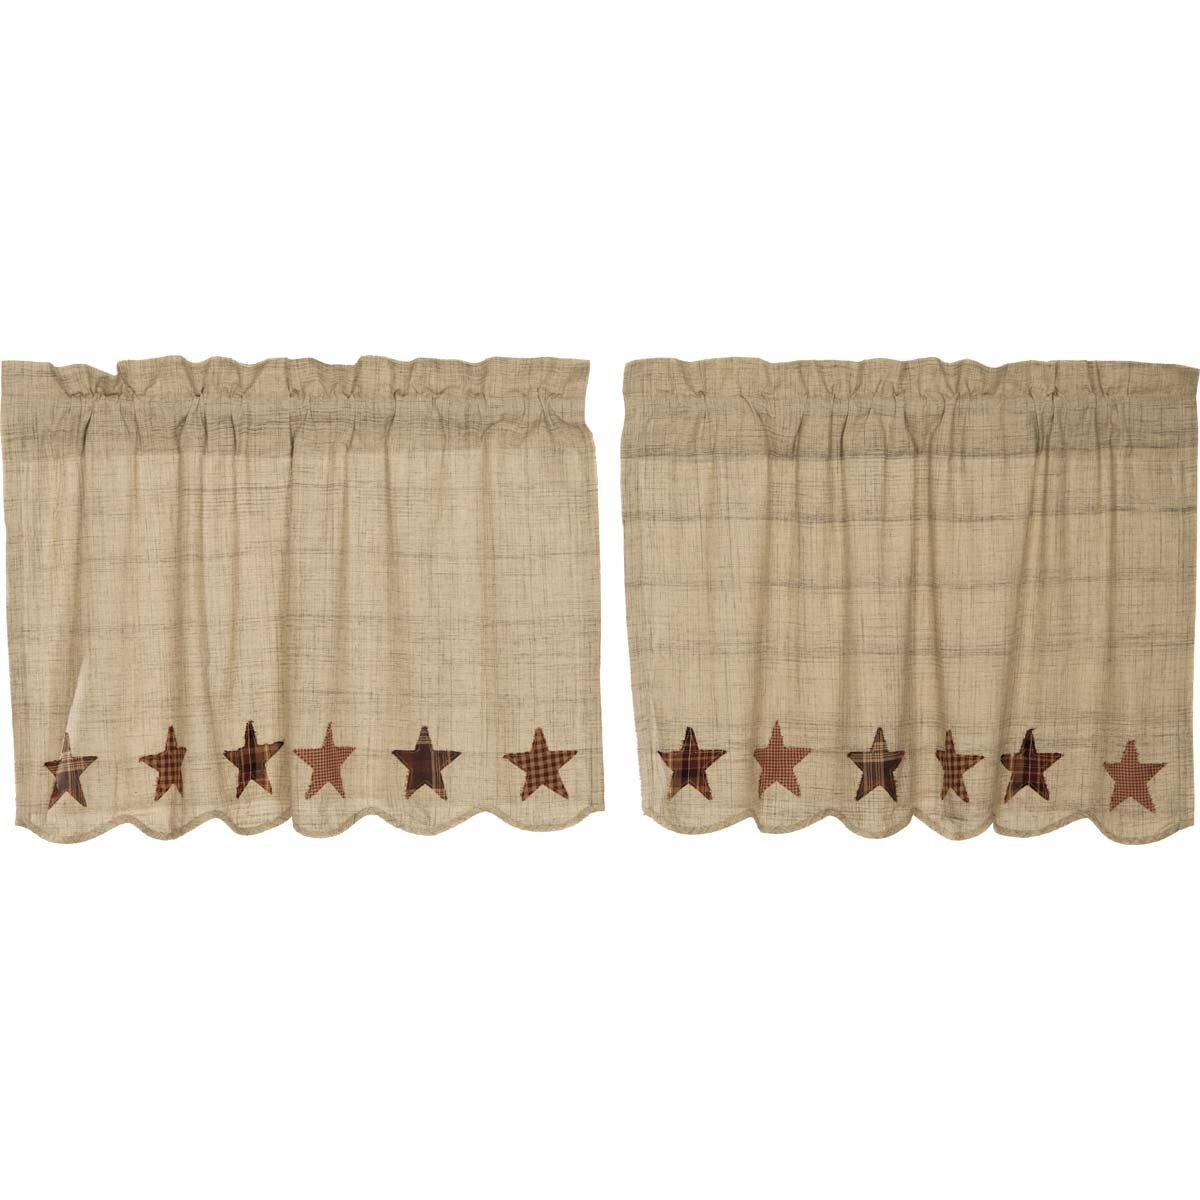 August Grove Lydia Cotton Scalloped Cafe Curtain In Grey Creme Tan Burgundy Dark Brown Reviews Wayfair